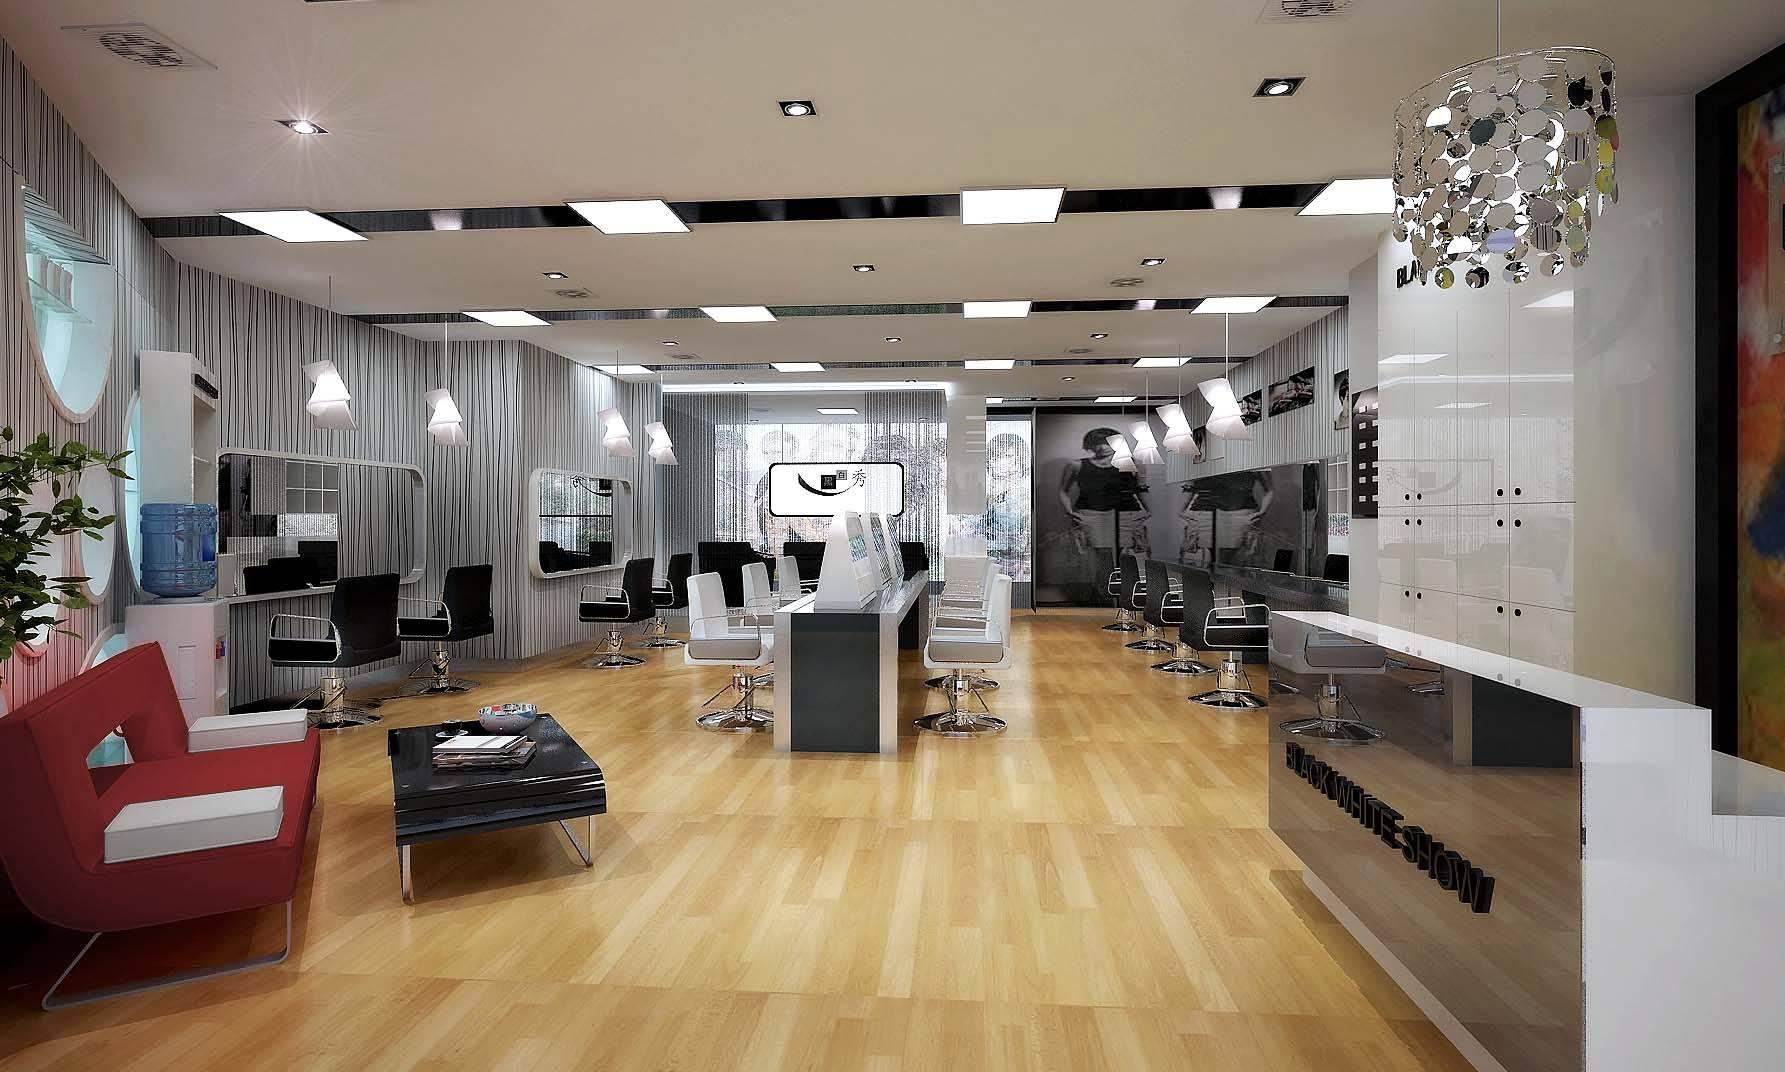 Barber shop hair newhairstylesformen2014 com